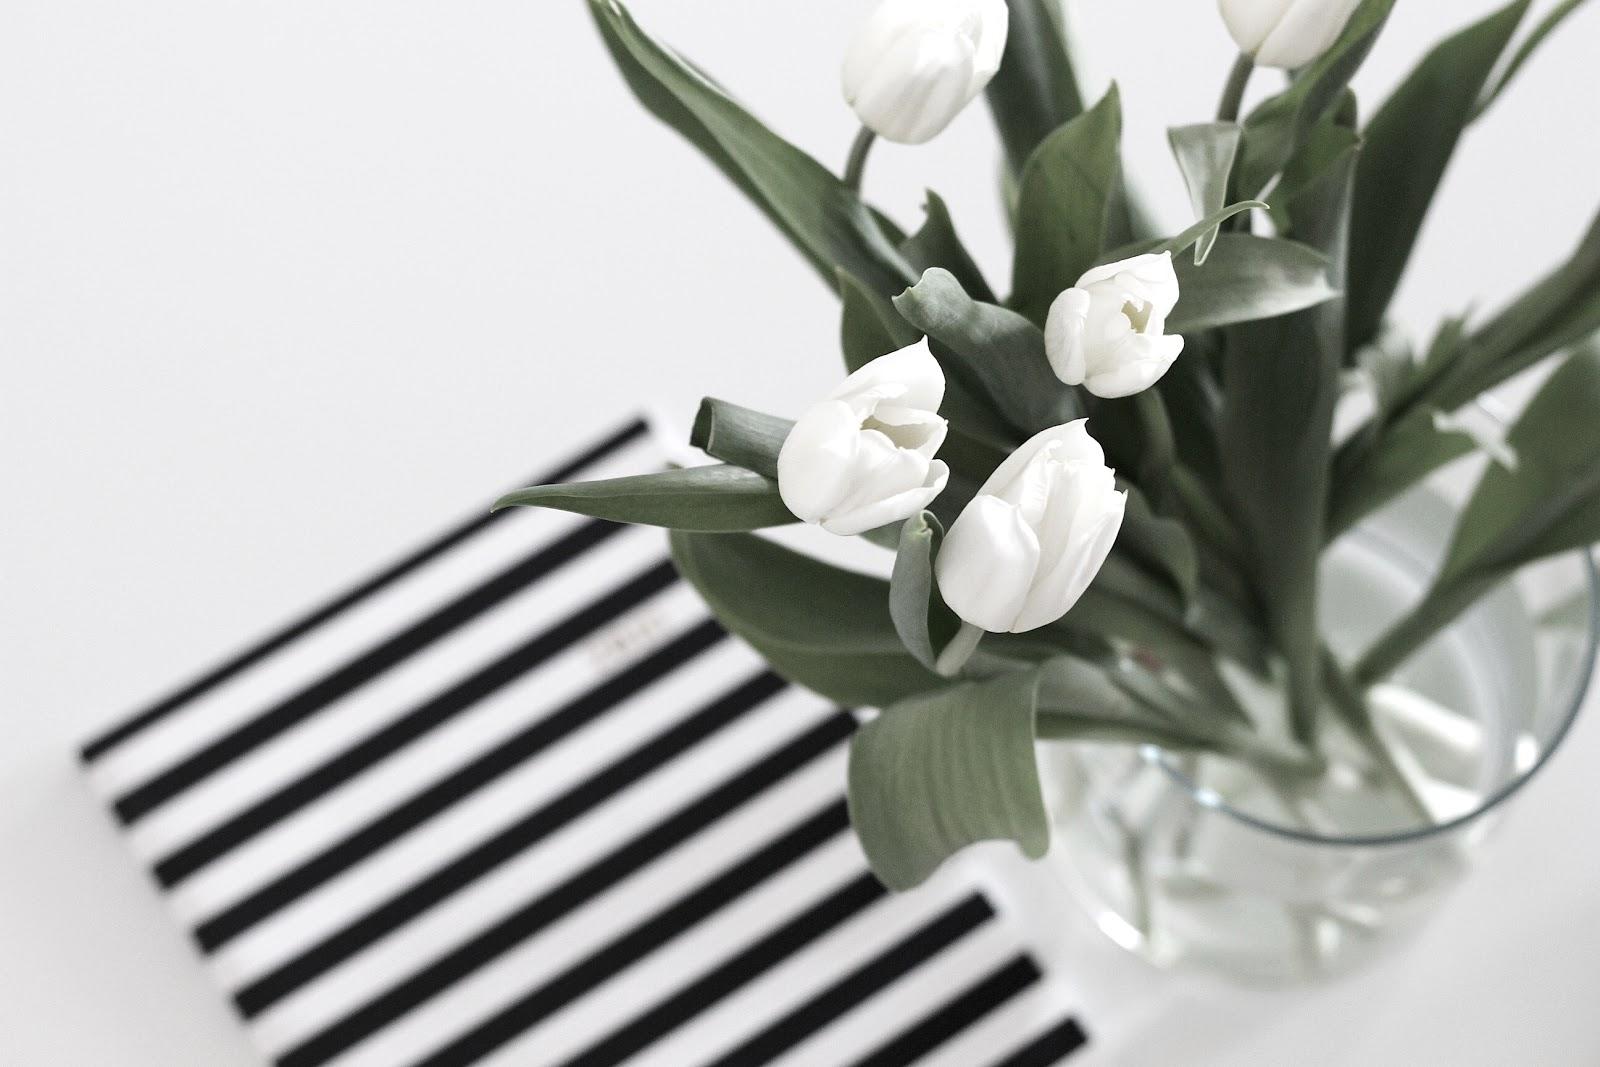 Blogging | 10 Things I Wish I Knew